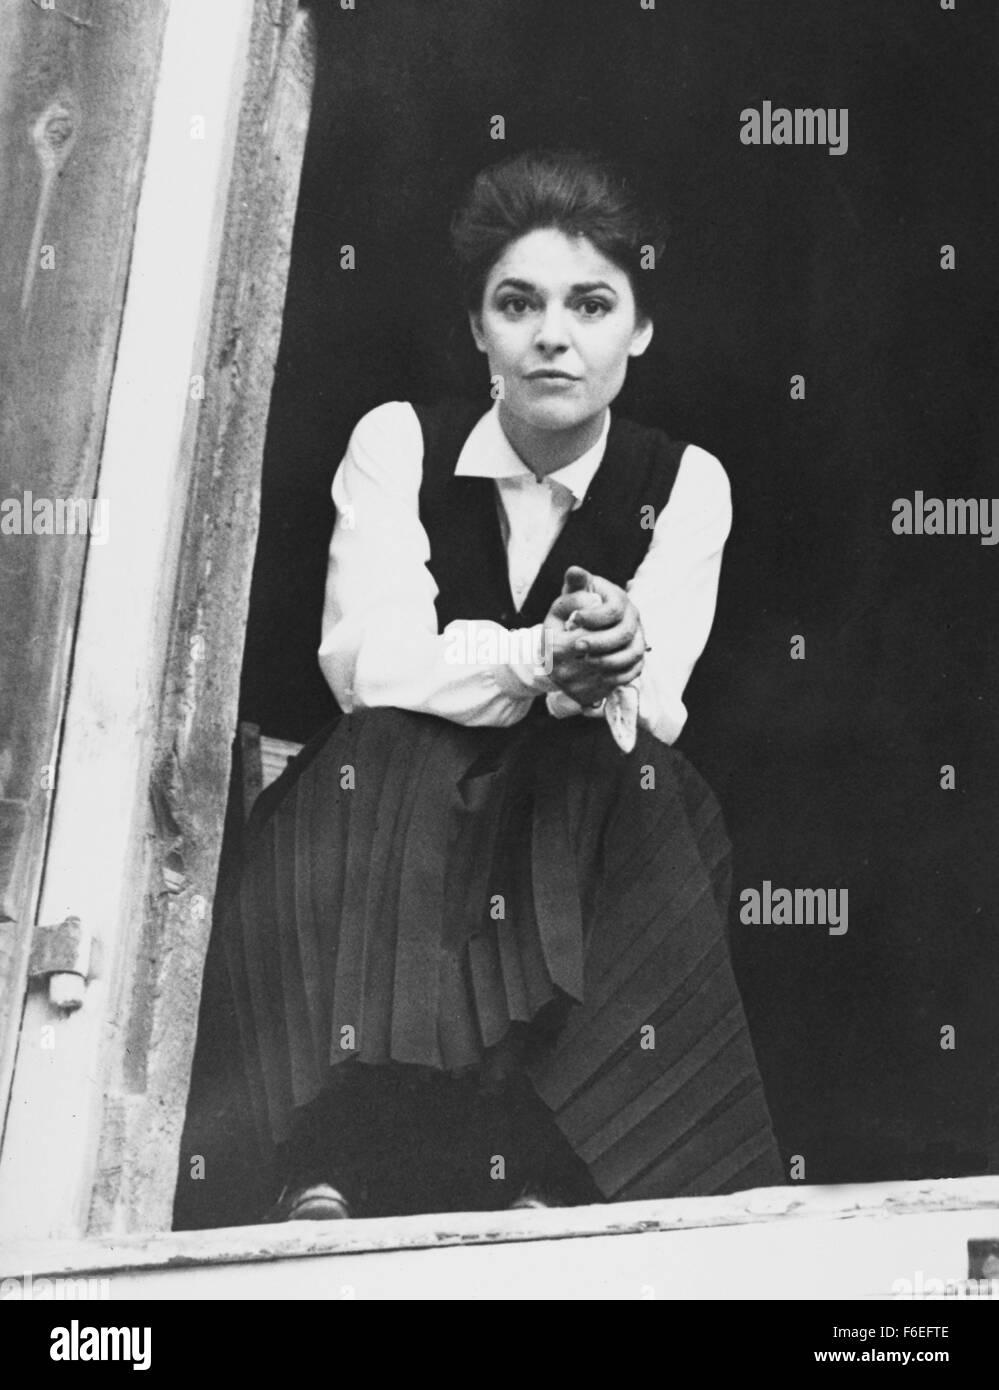 Jan 15, 1962; USA; RELEASE DATE: 1962. DIRECTOR: Arthur Penn. STUDIO: MGM. PLOT: Young Helen Keller, blind, deaf, - Stock Image